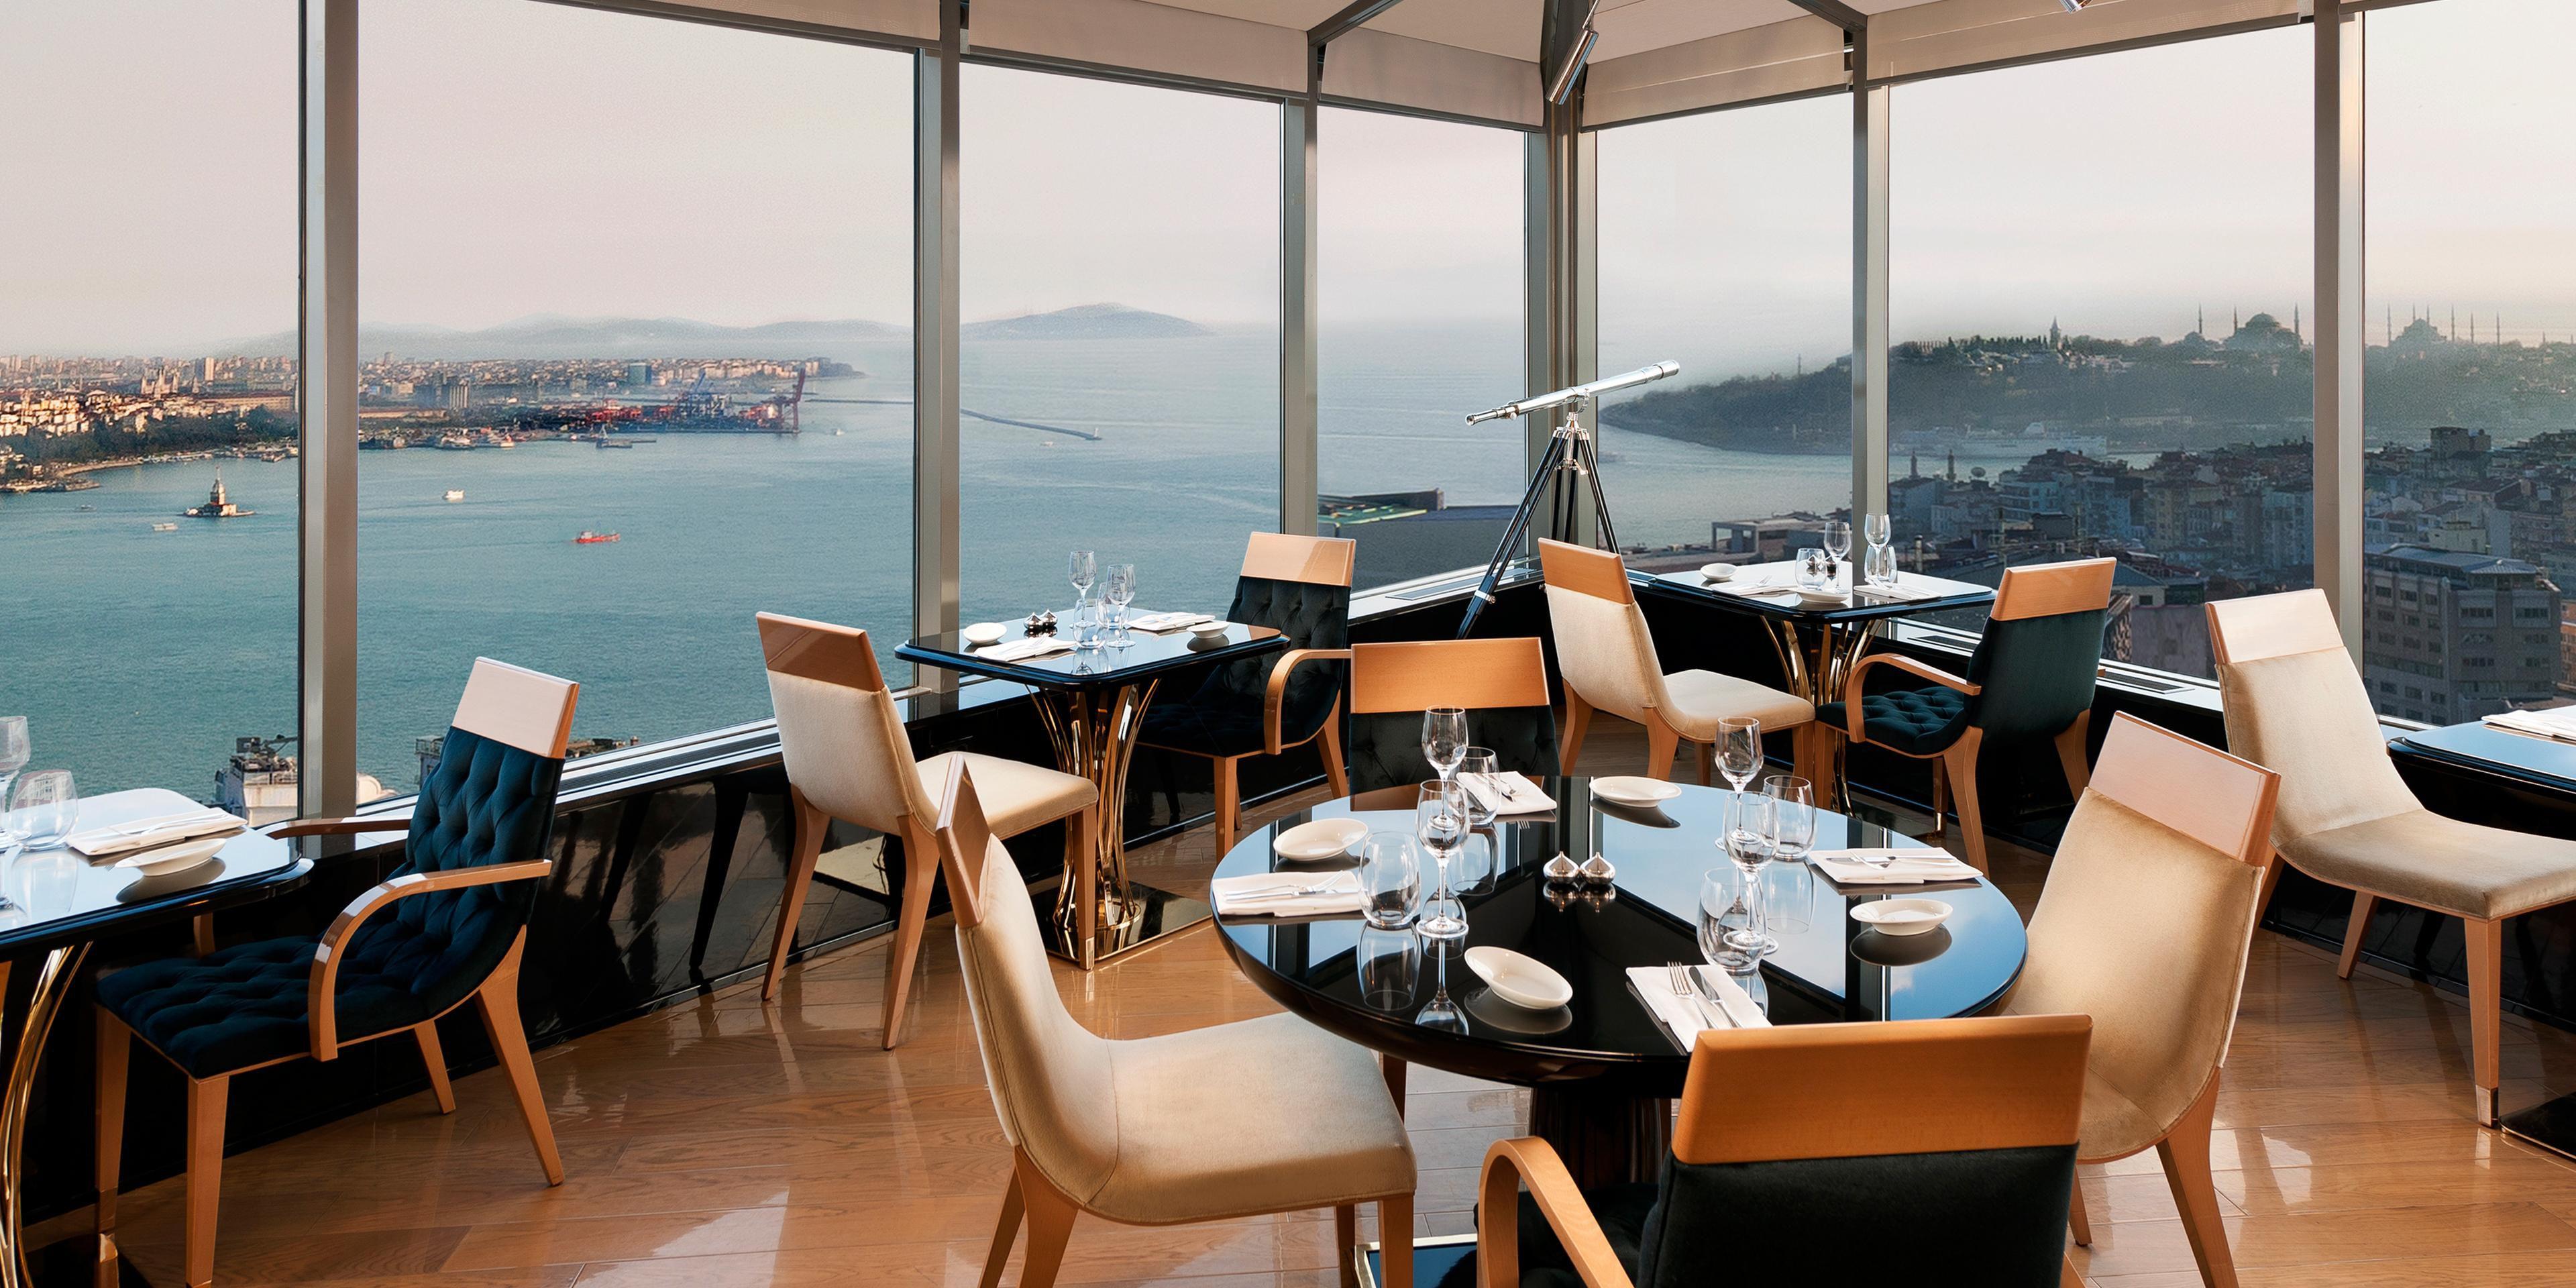 Luxury hotel with pool intercontinental hotel istanbul city lights restaurant bar aloadofball Gallery